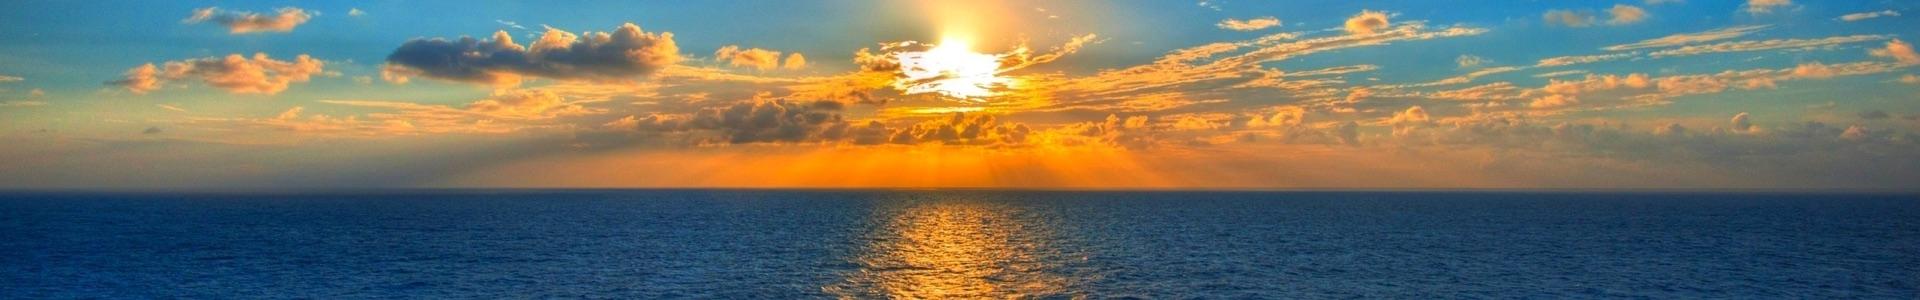 Georgia Sea Banner